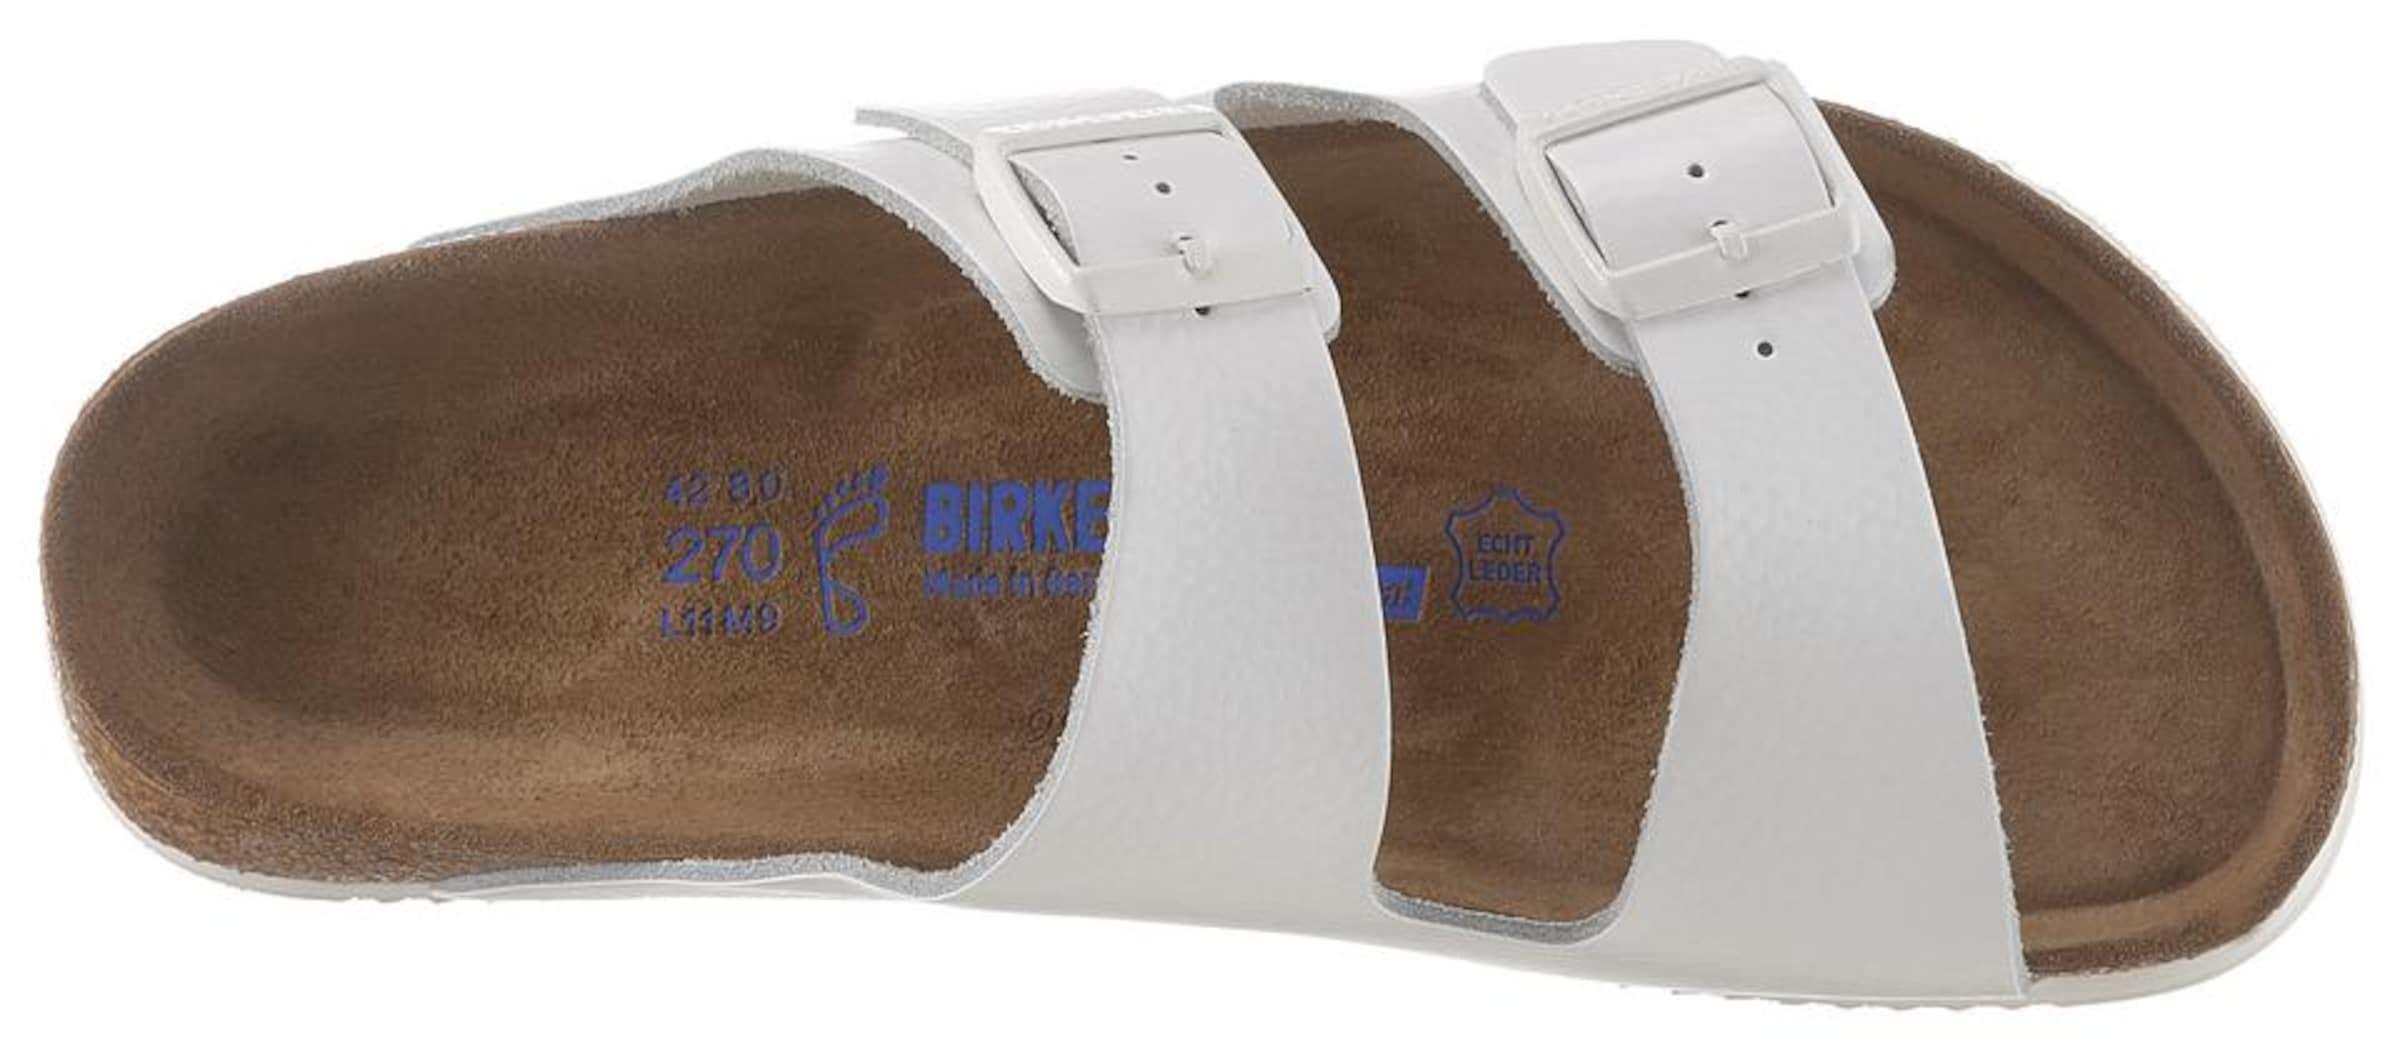 Birkenstock In Weiß Pantolette Pantolette Weiß Weiß Pantolette In In Birkenstock In Birkenstock Pantolette Birkenstock v80mNnw